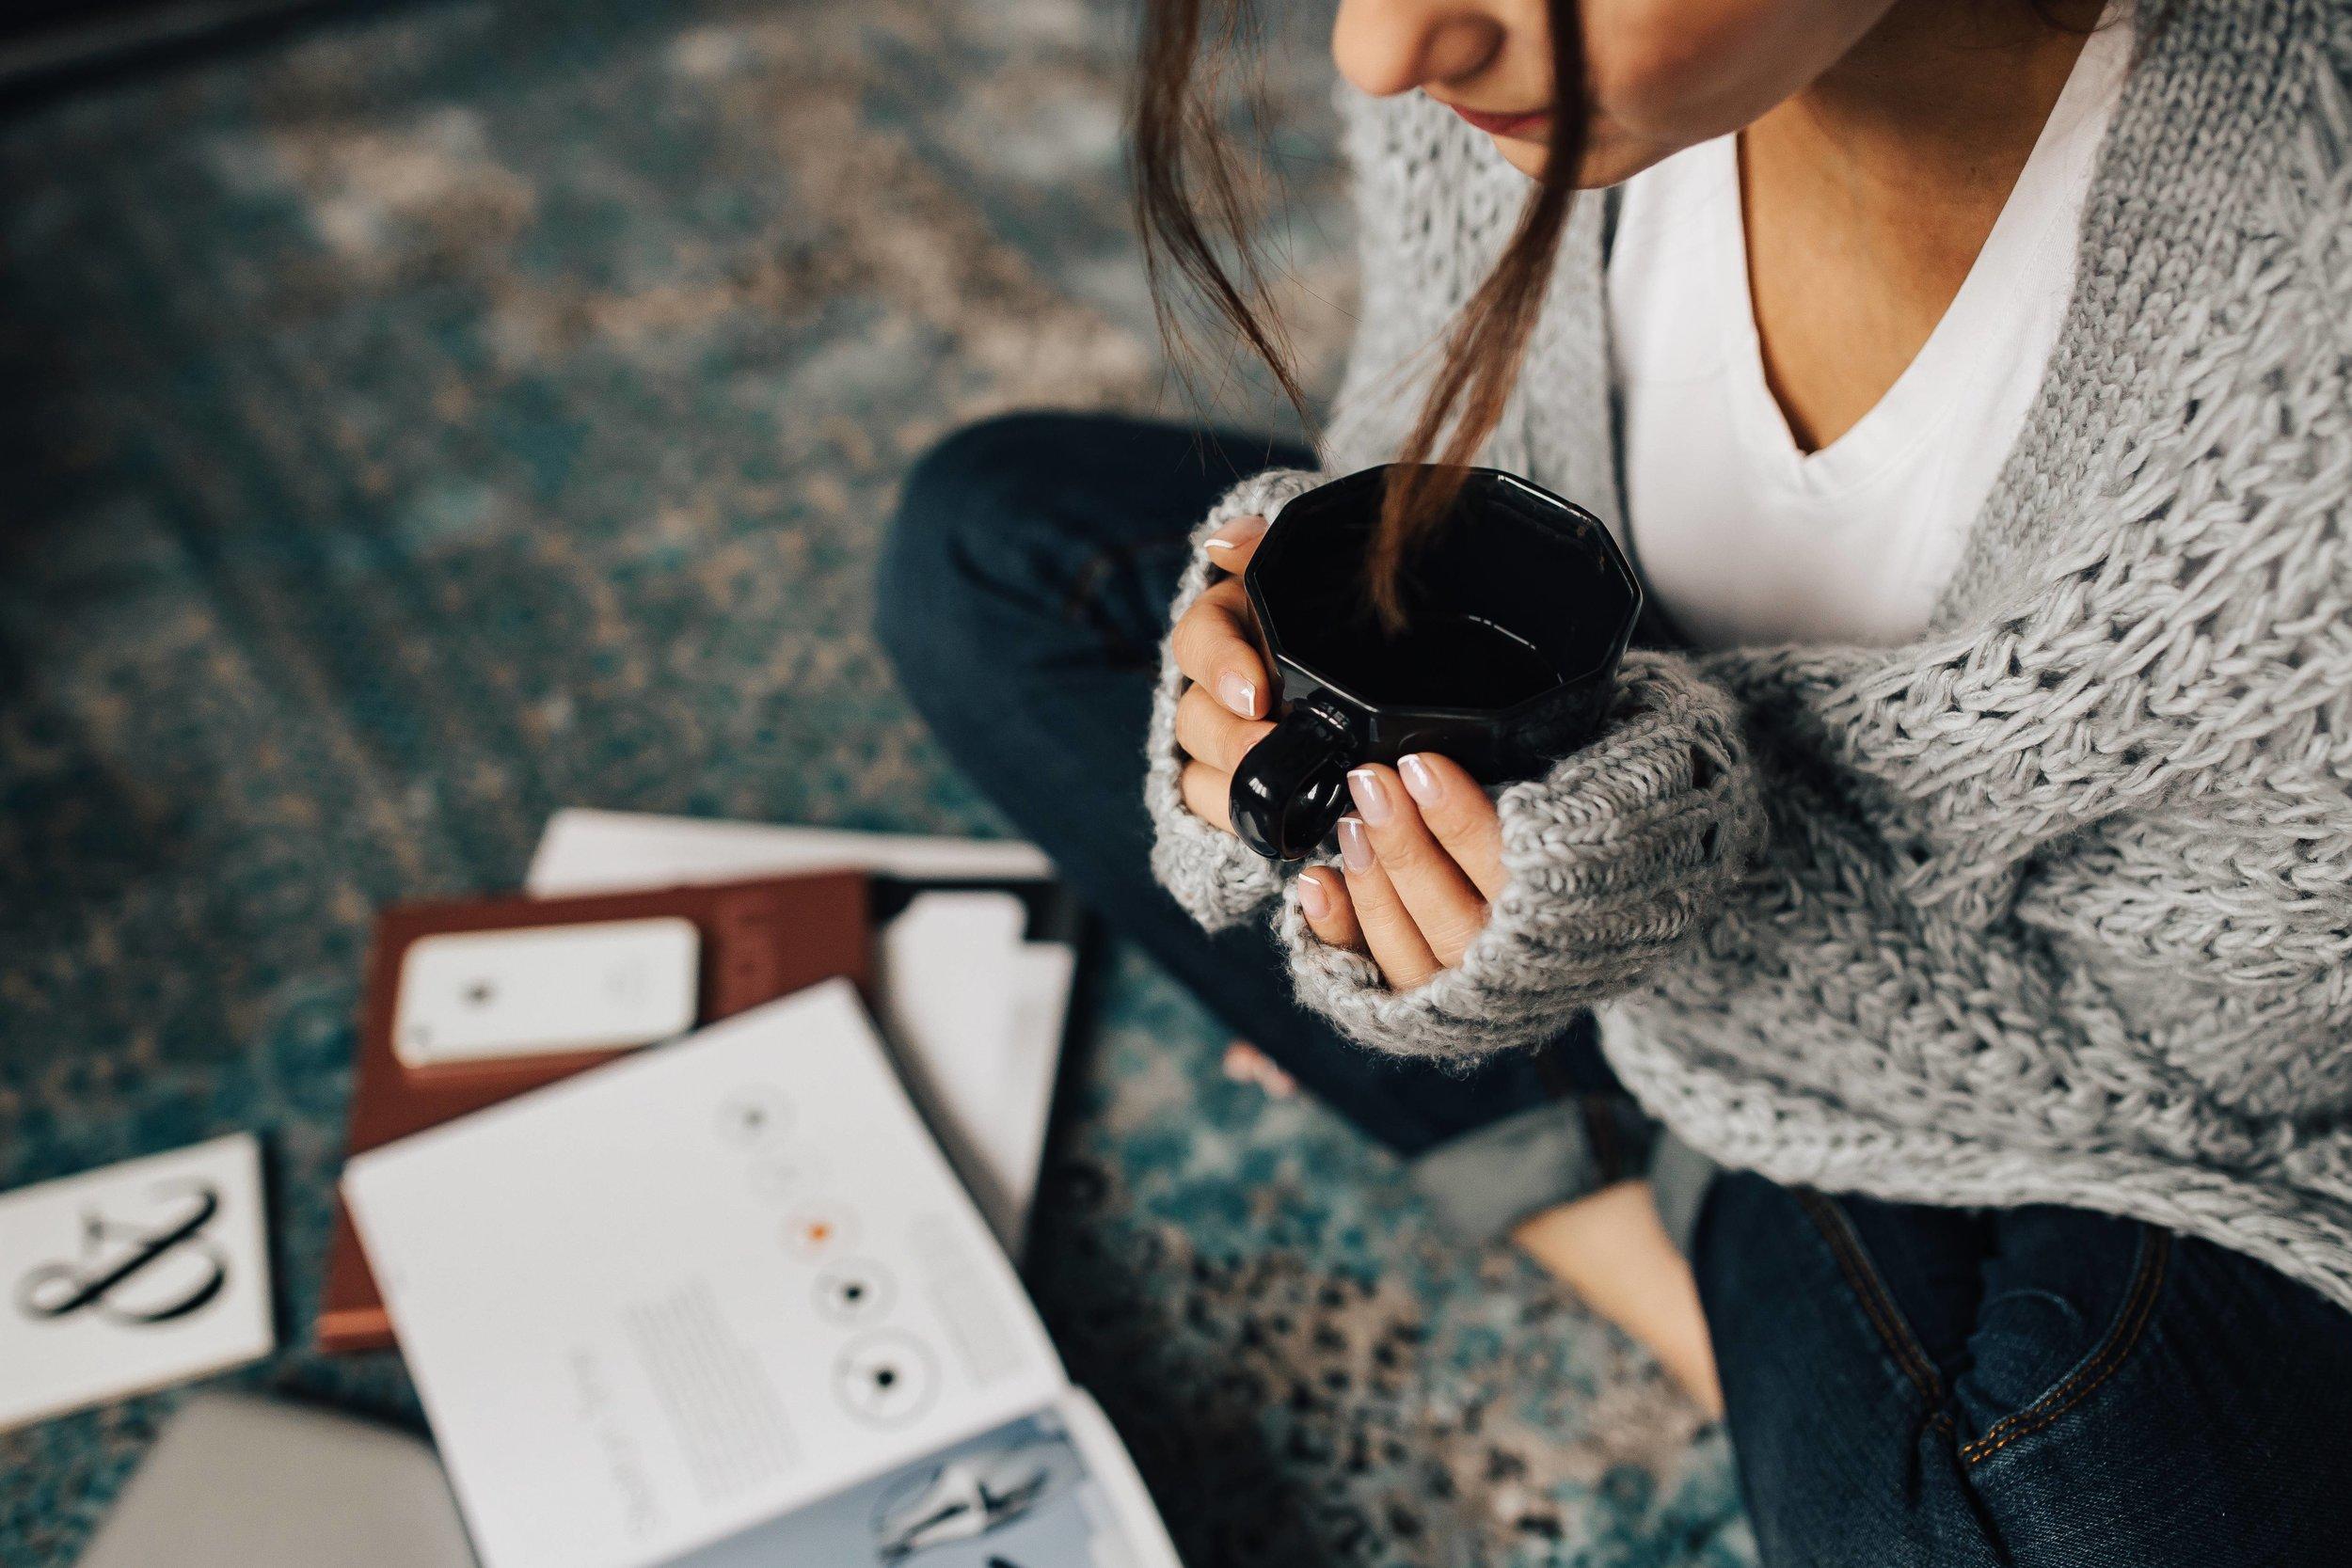 kaboompics_Woman reading magazines on the floor while enjoying hercup of tea.jpg